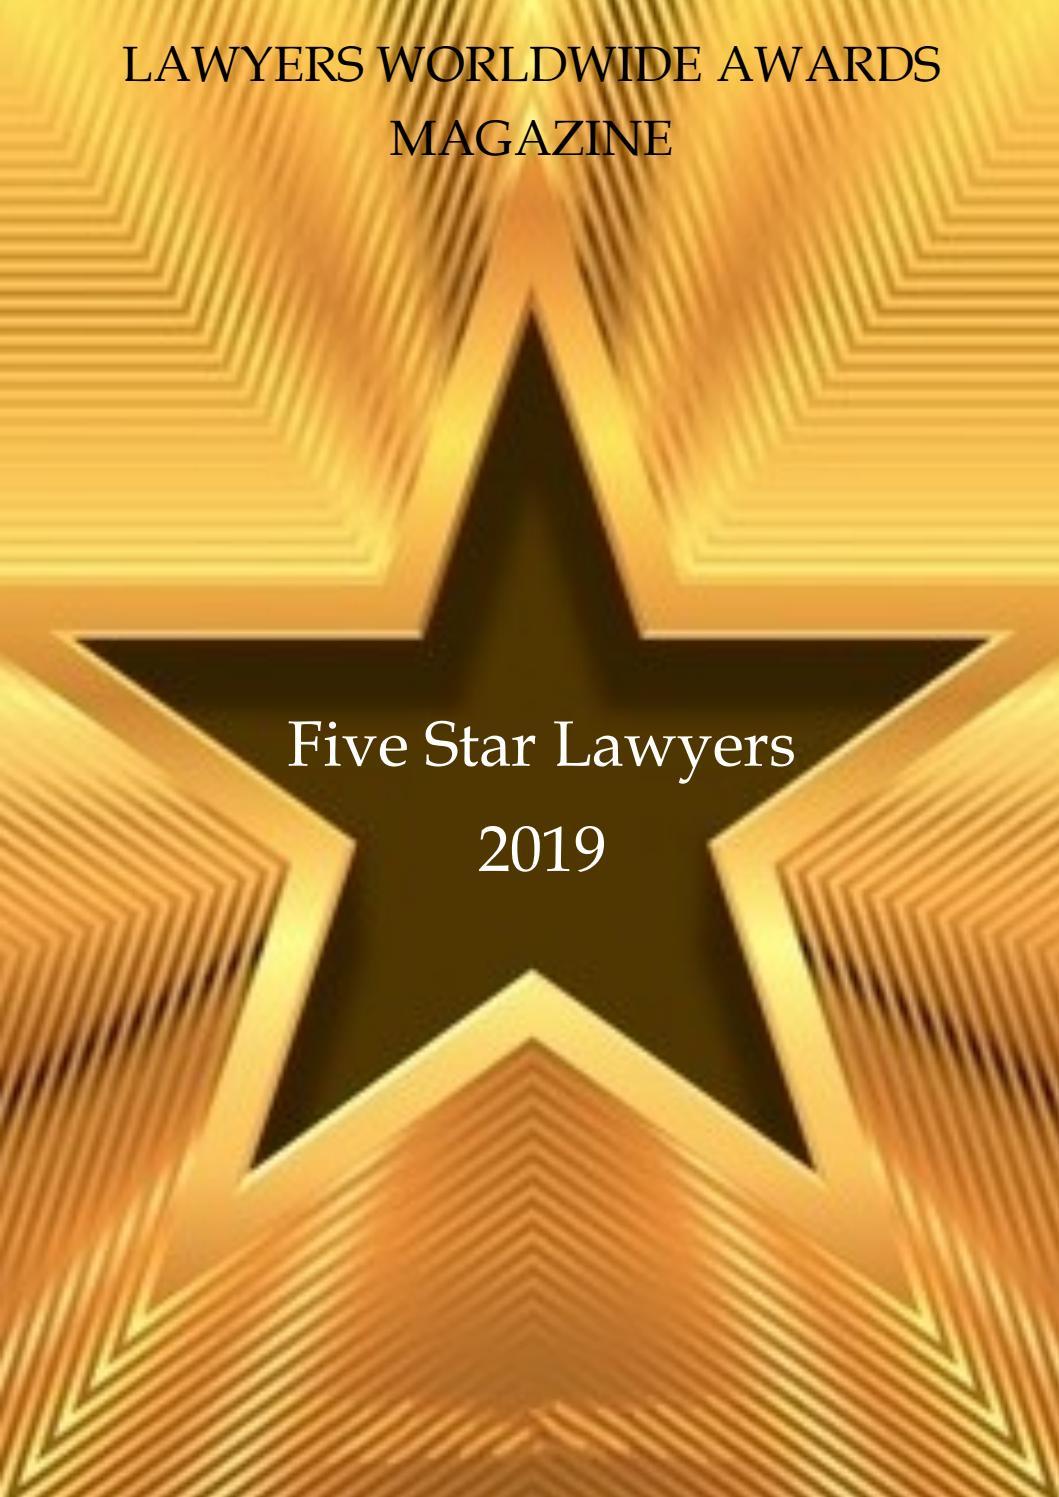 5 star lawyers magazine by Productive Media - issuu